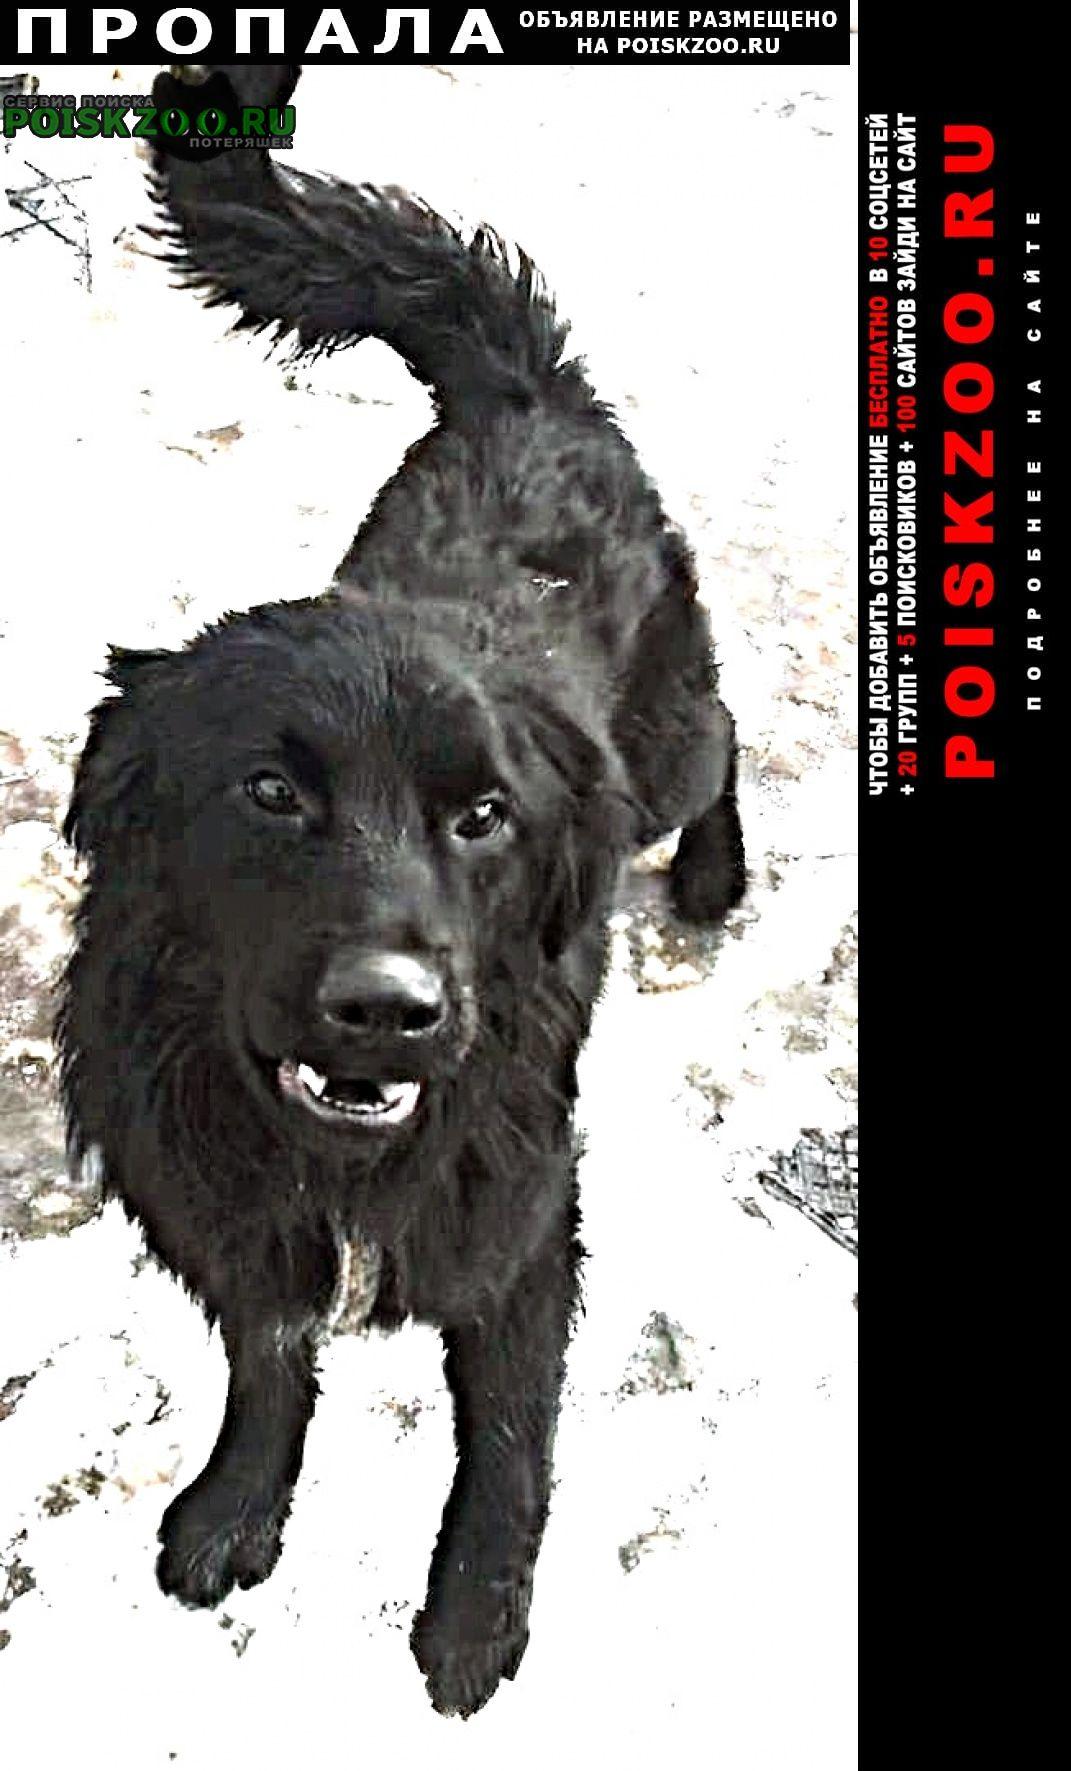 Пропала собака кобель помогите найти Белгород